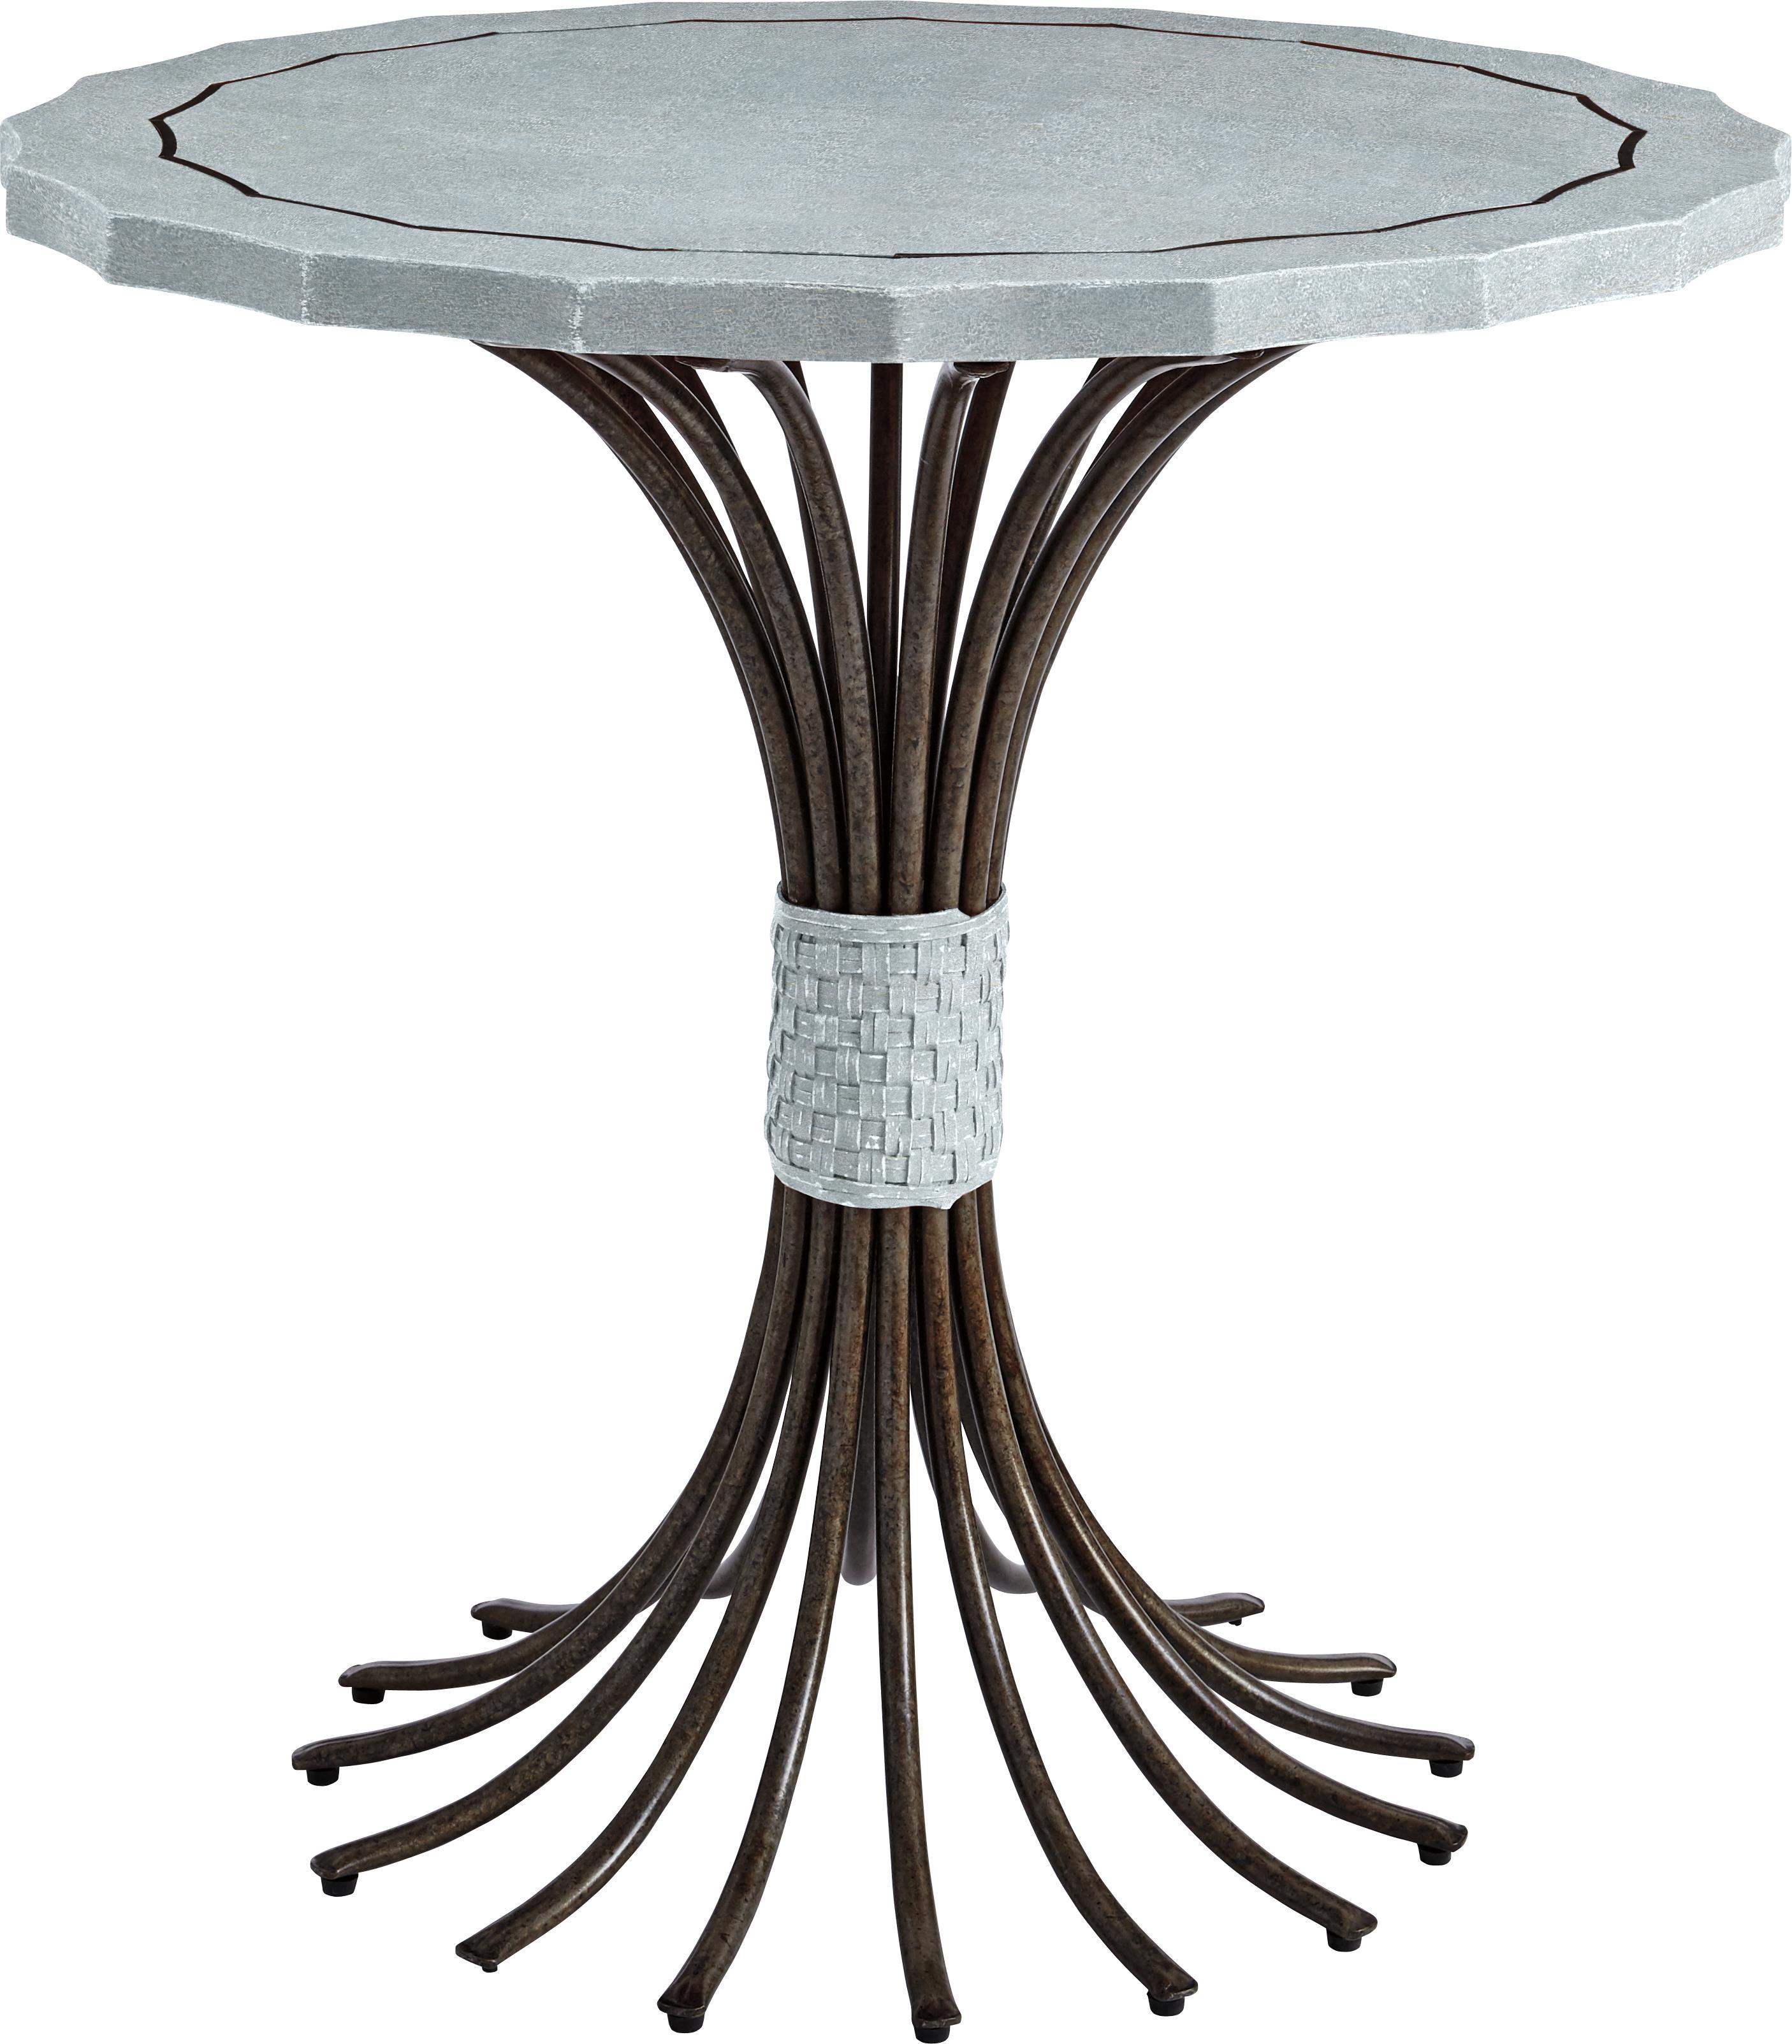 Stanley Furniture Coastal Living Resort Eddy's Landing Lamp Table - Item Number: 062-H5-08